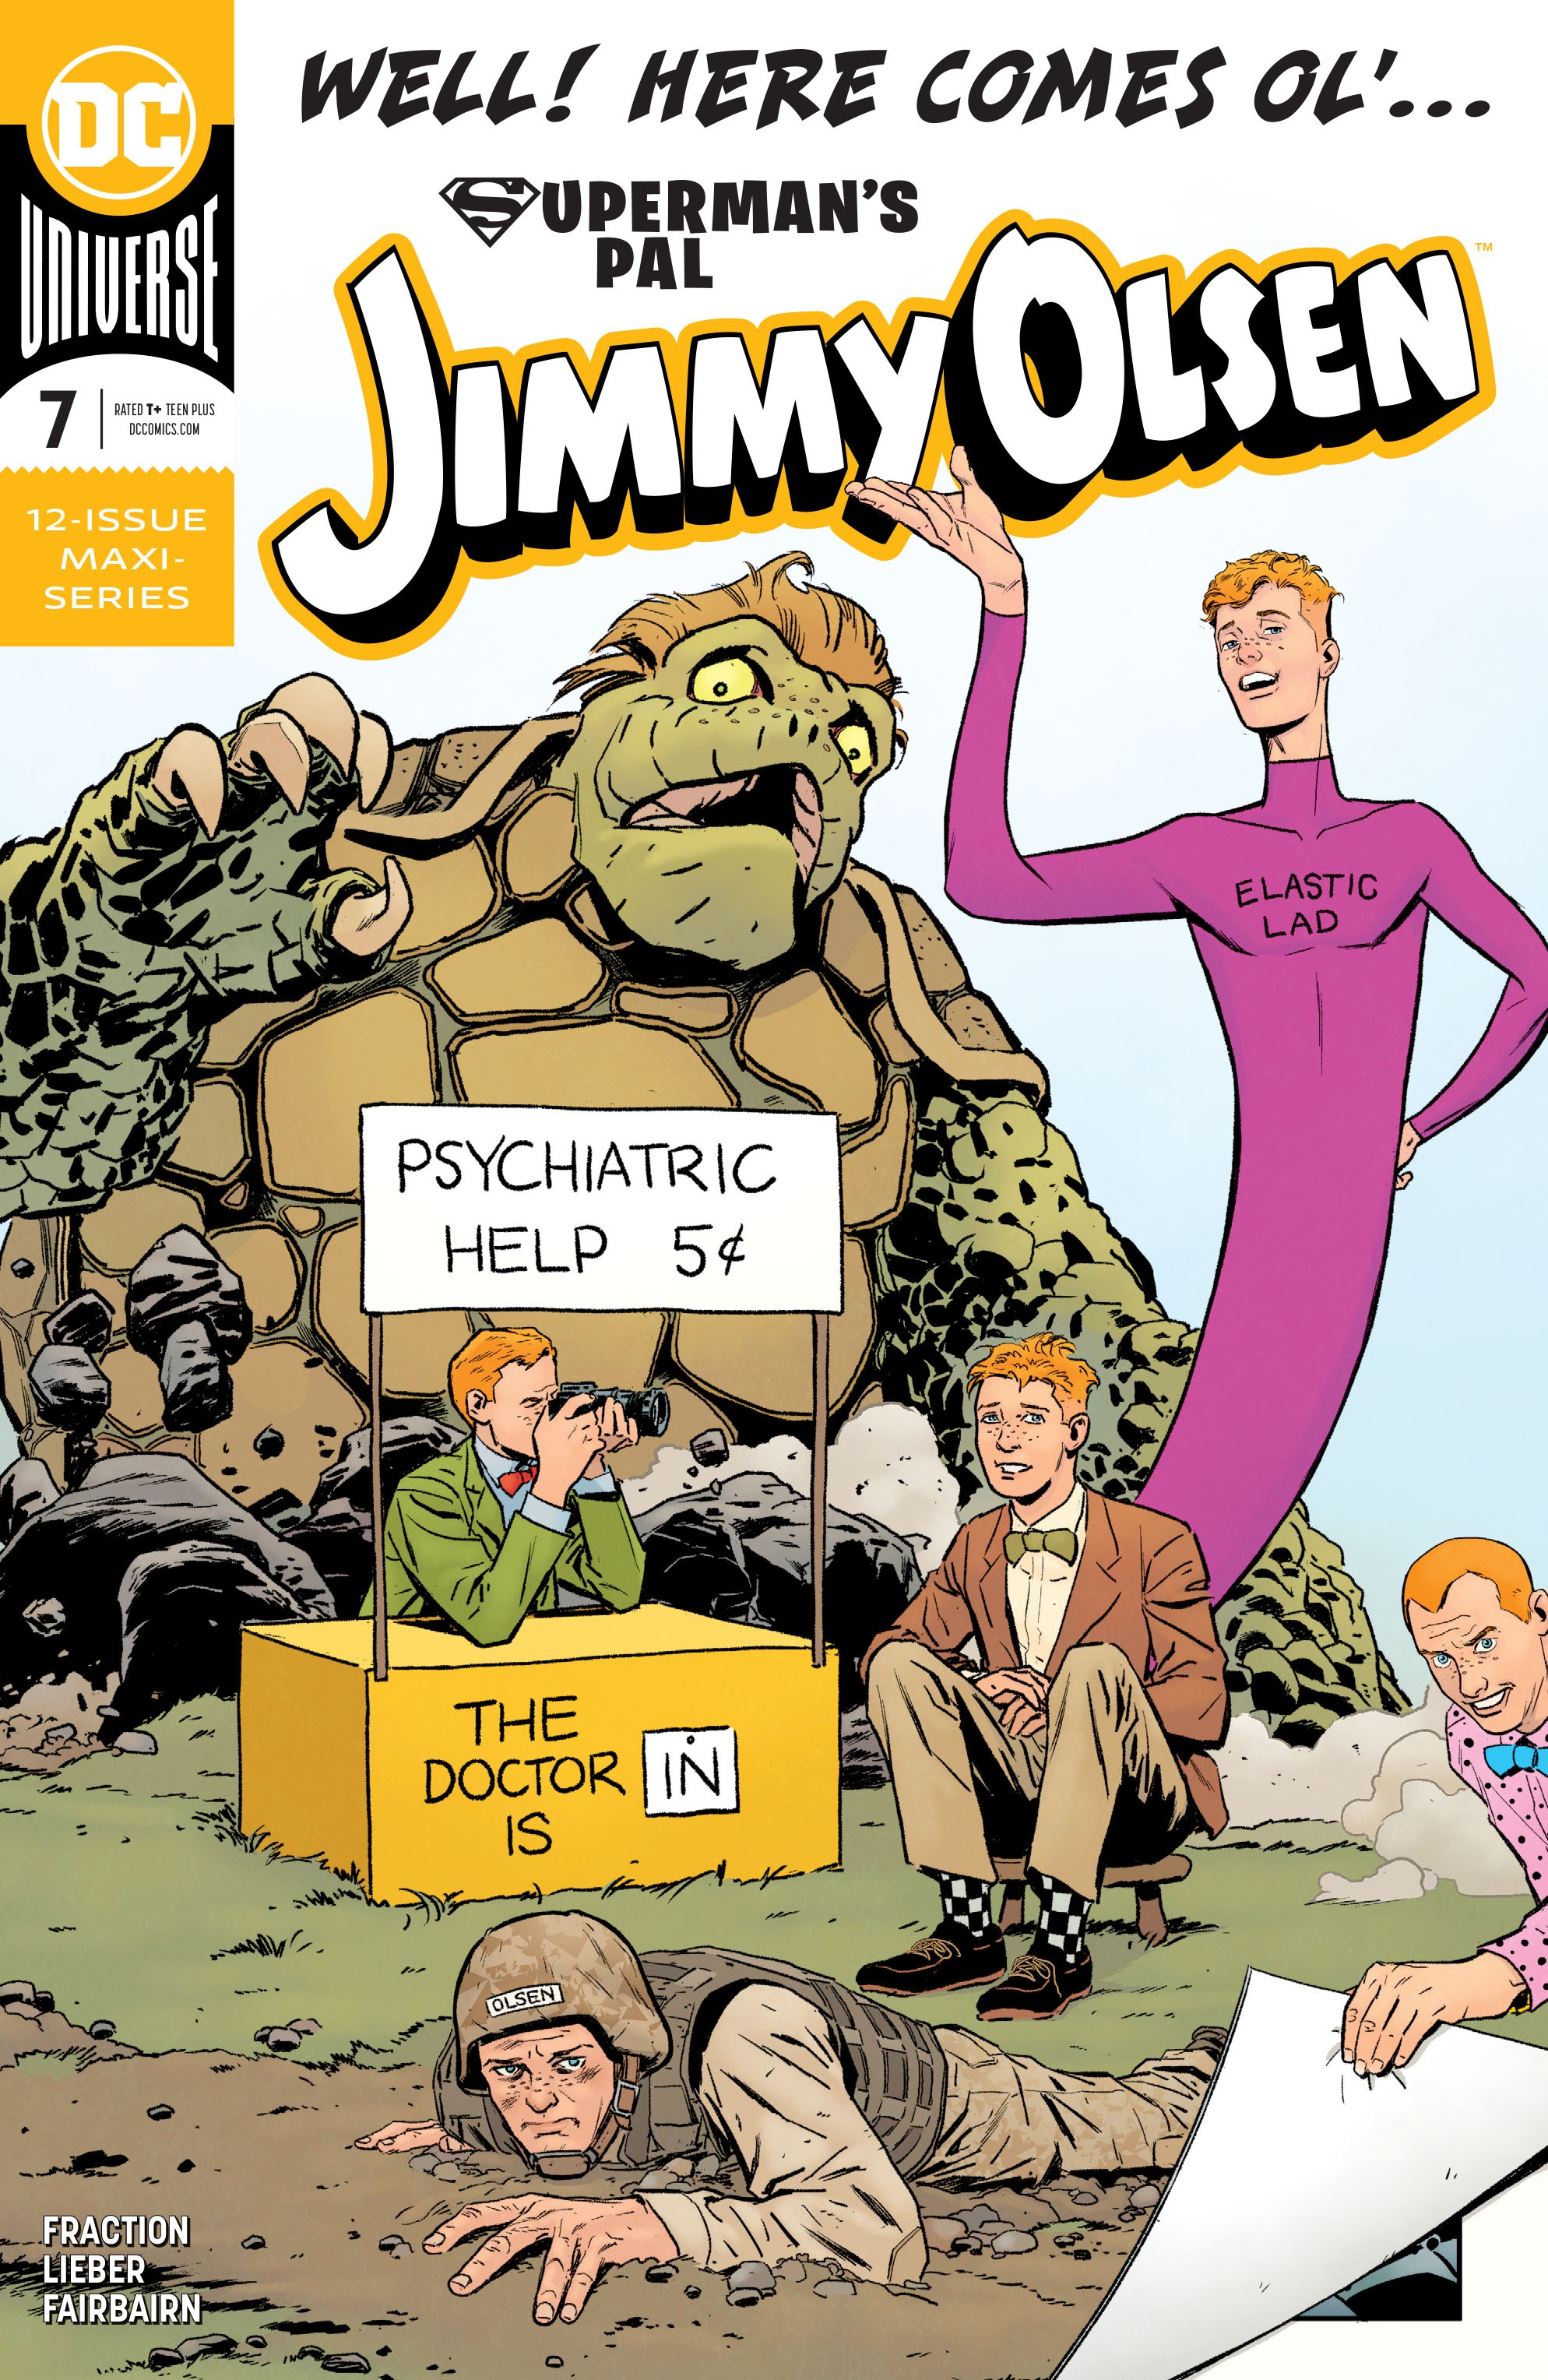 Supermans Pal Jimmy Olsen (2019) 7 Page 1